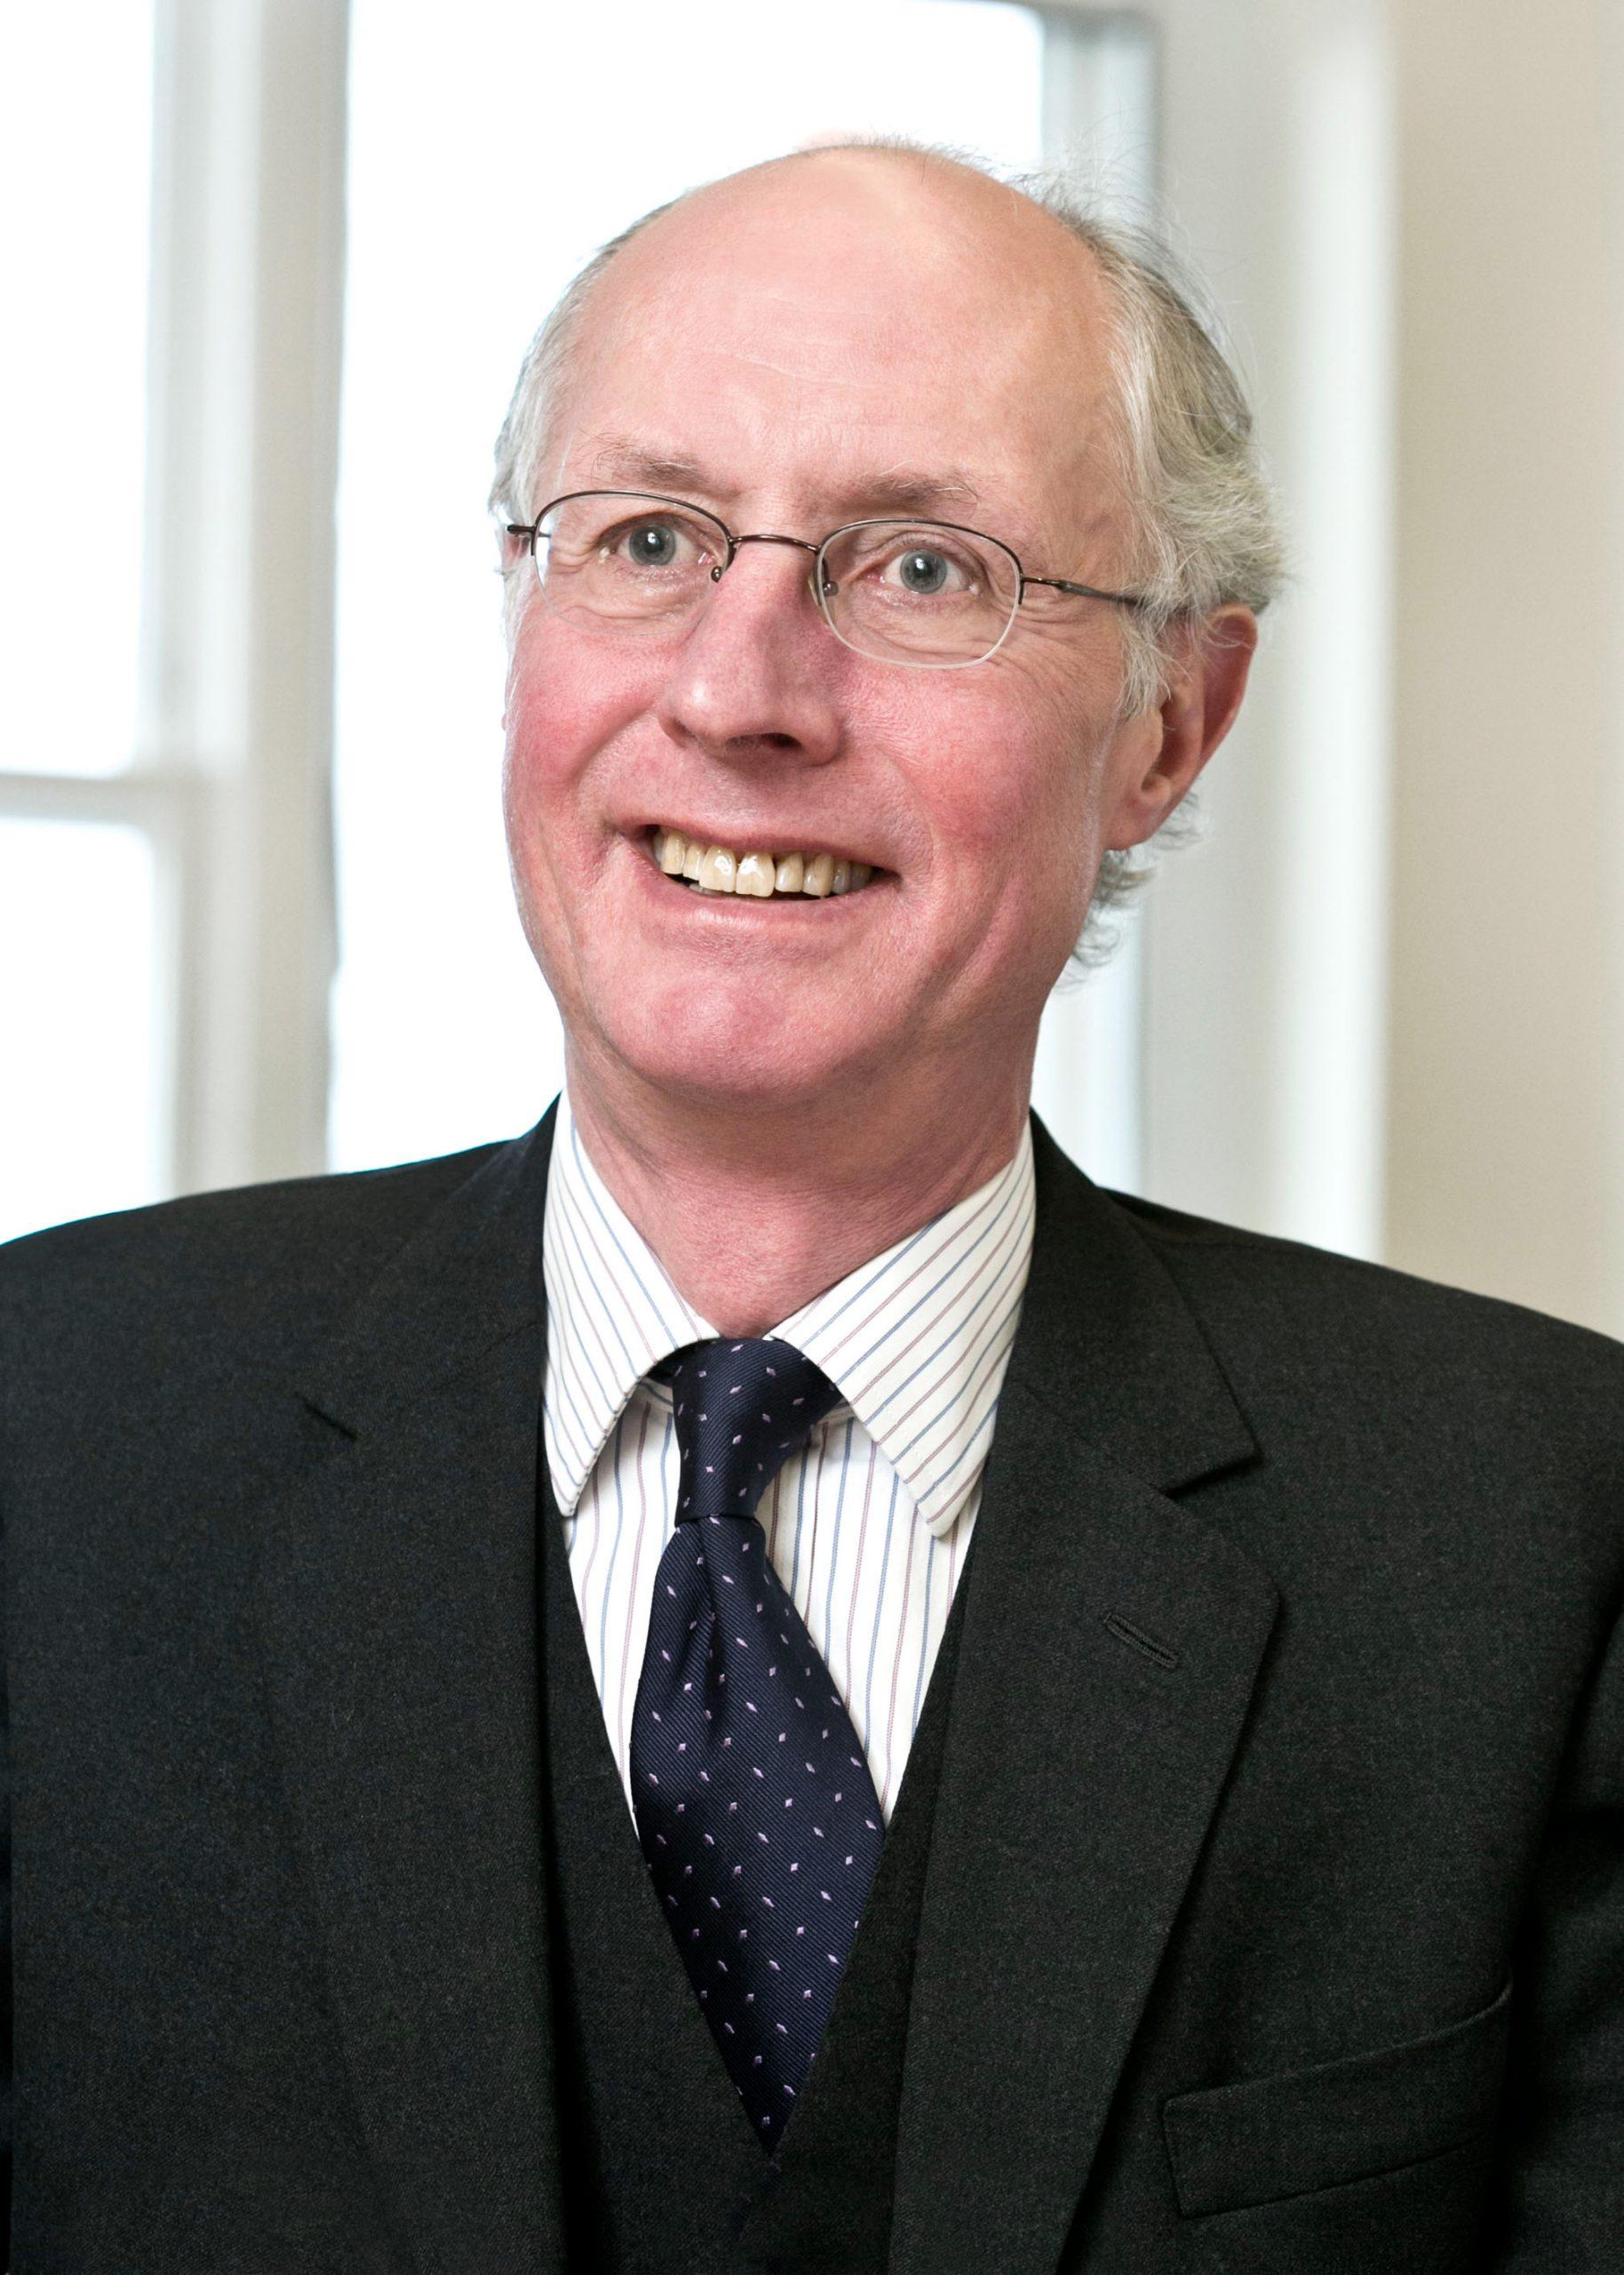 Michael Camps